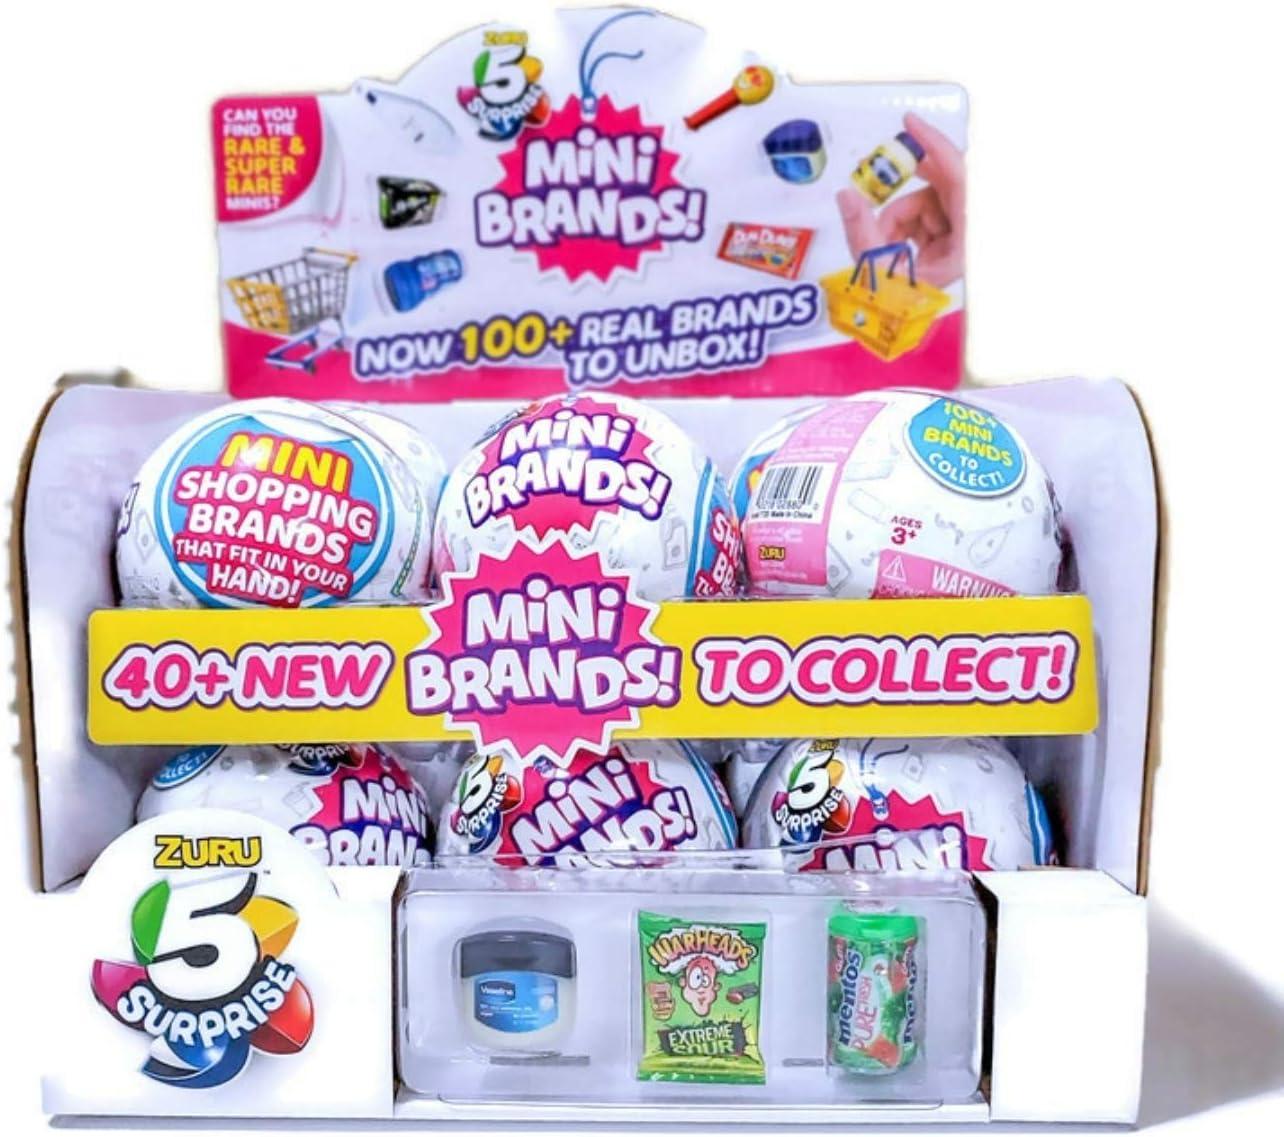 Zuru 5 Surprise Mini Brands Case of 12 Capsule Balls with Food Stickers